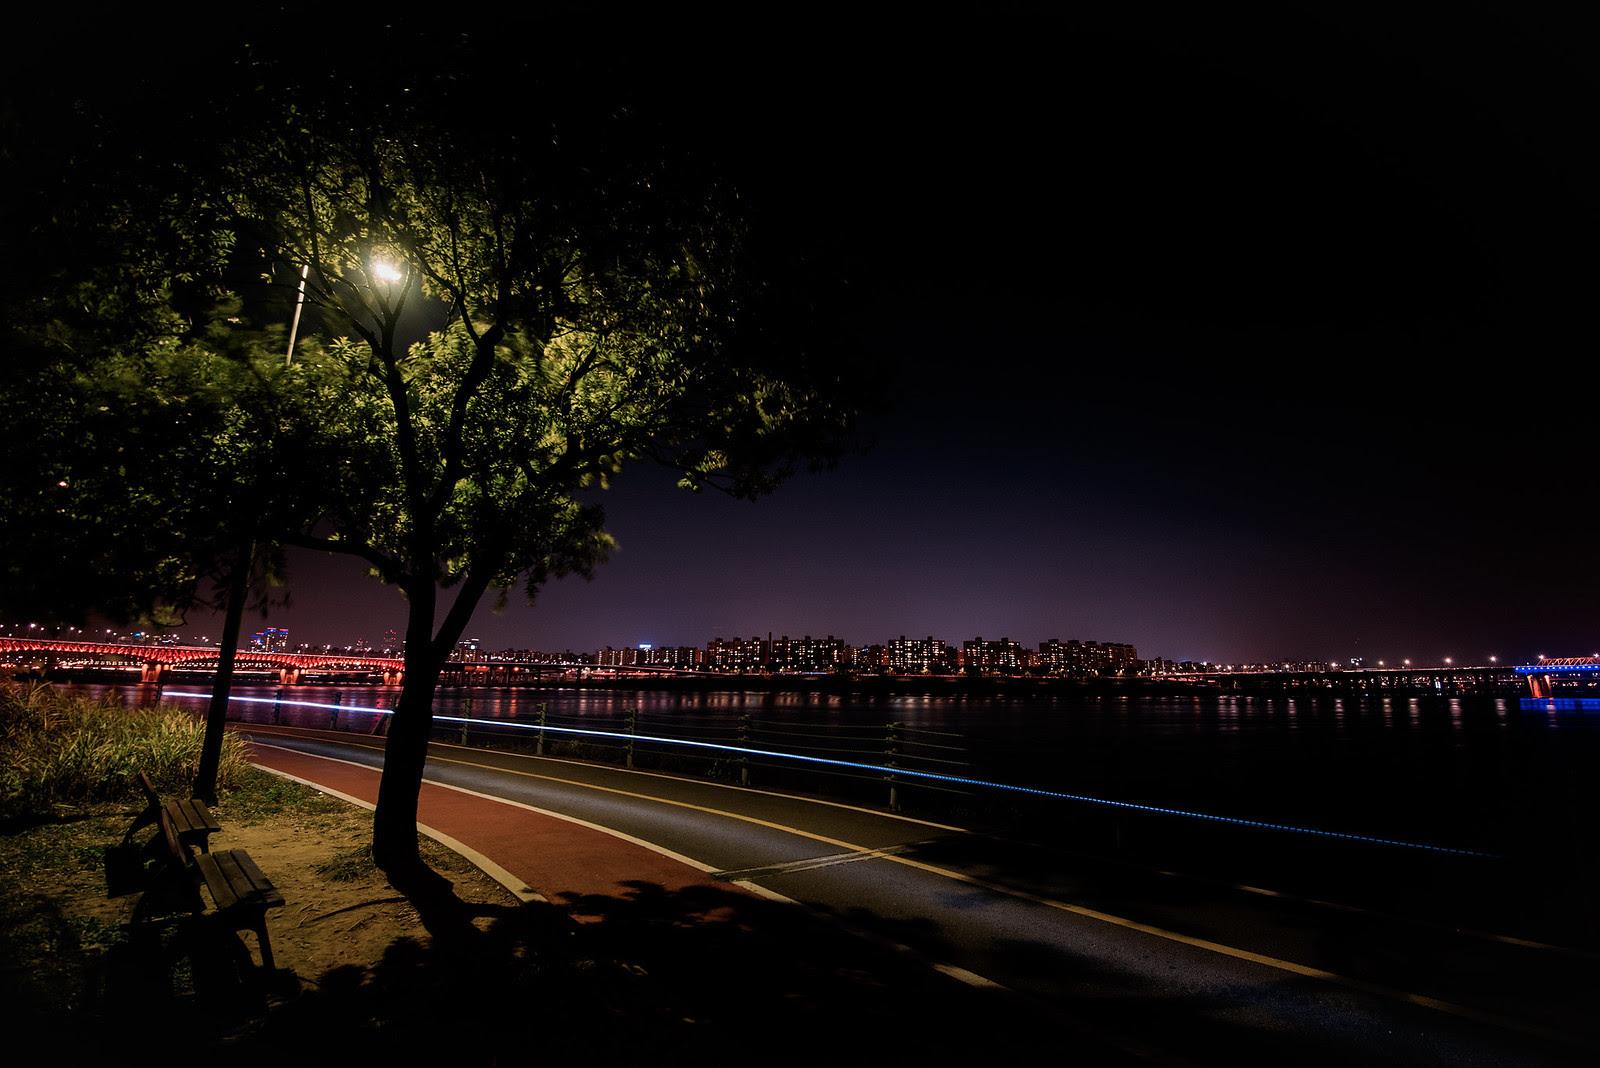 Lights on the Han River